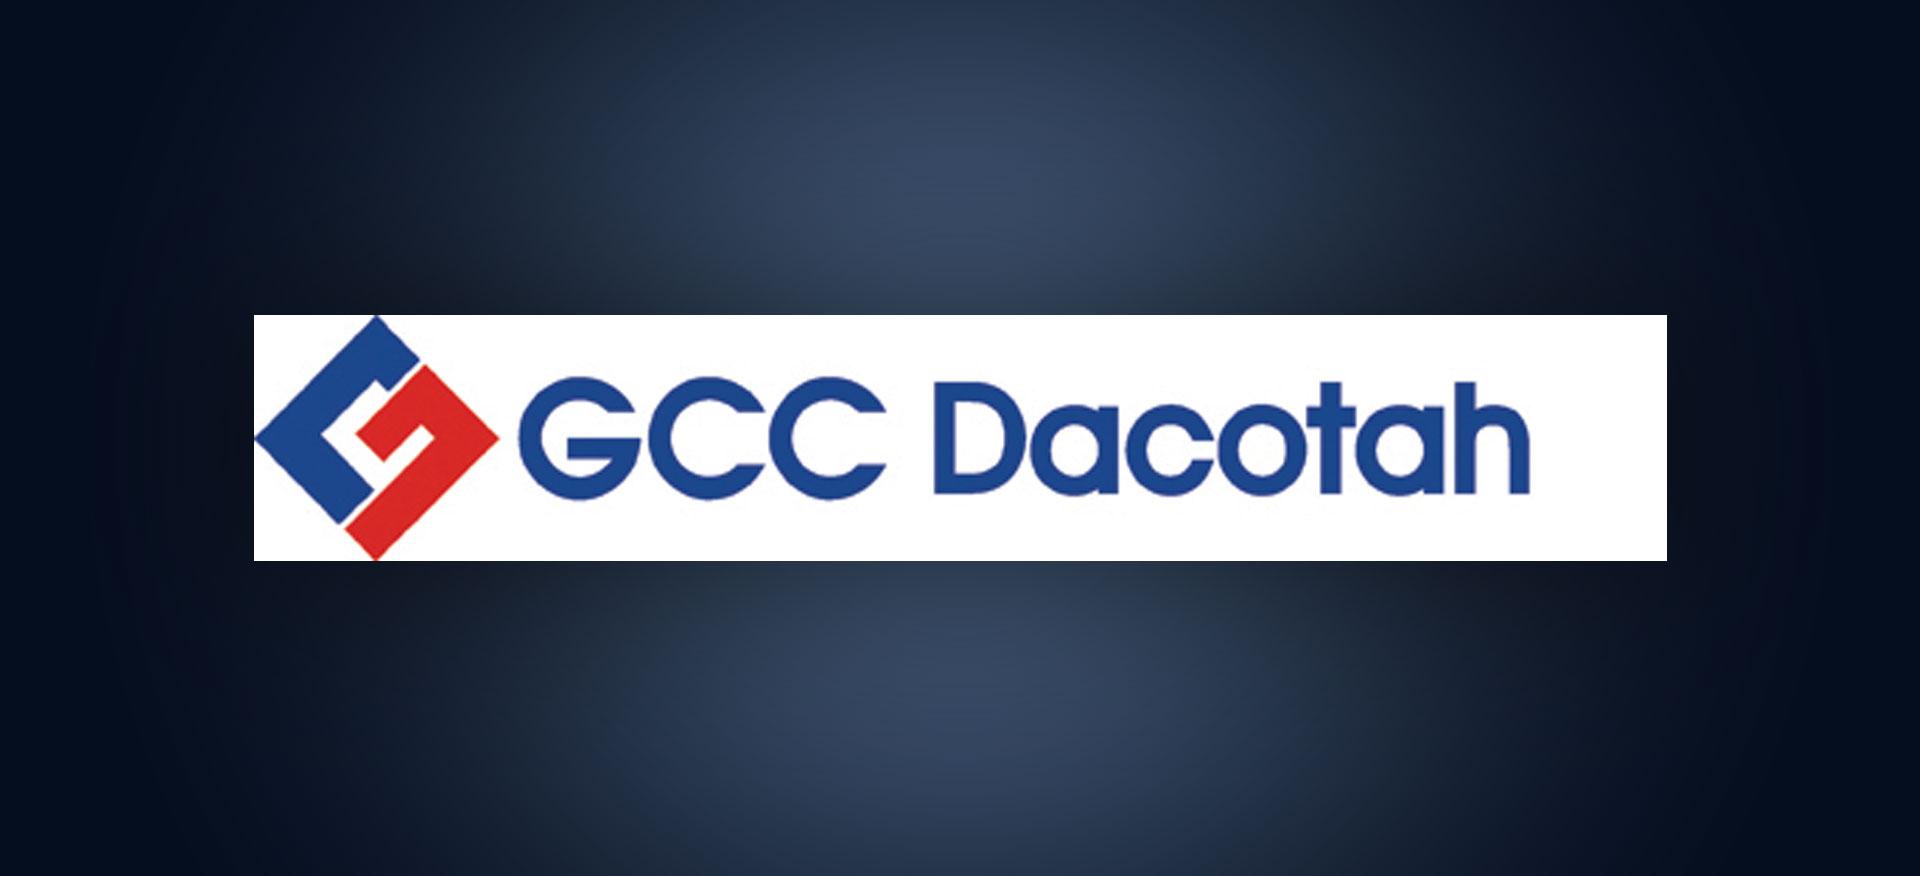 Gcc Dacotah Rapid City Sd